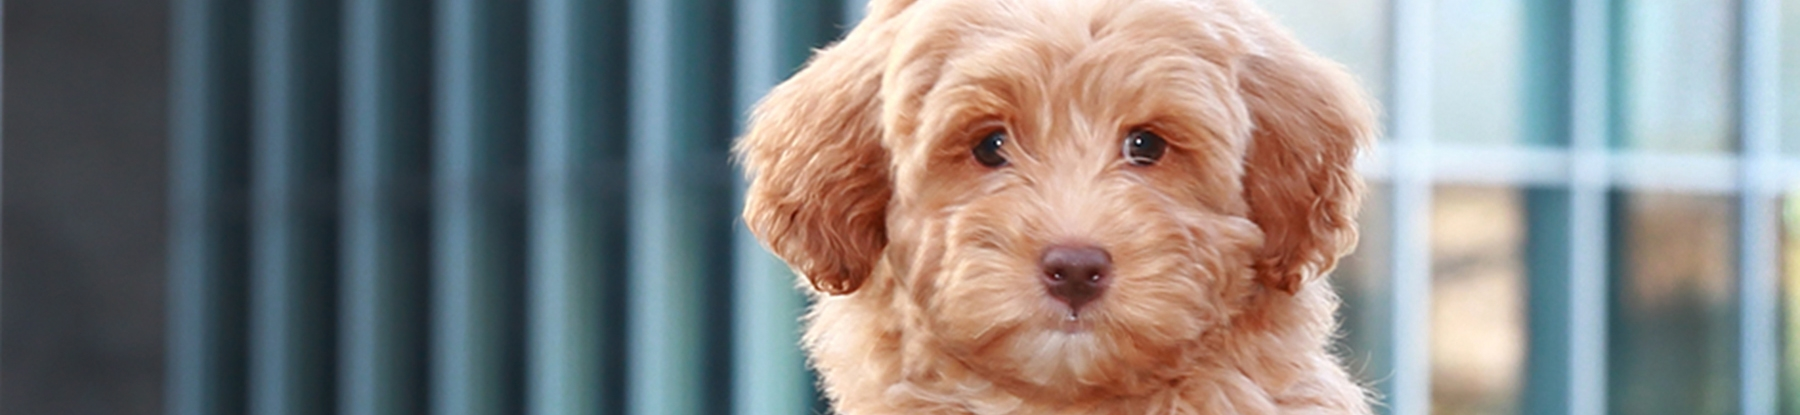 Breen Pup 1_color.jpg